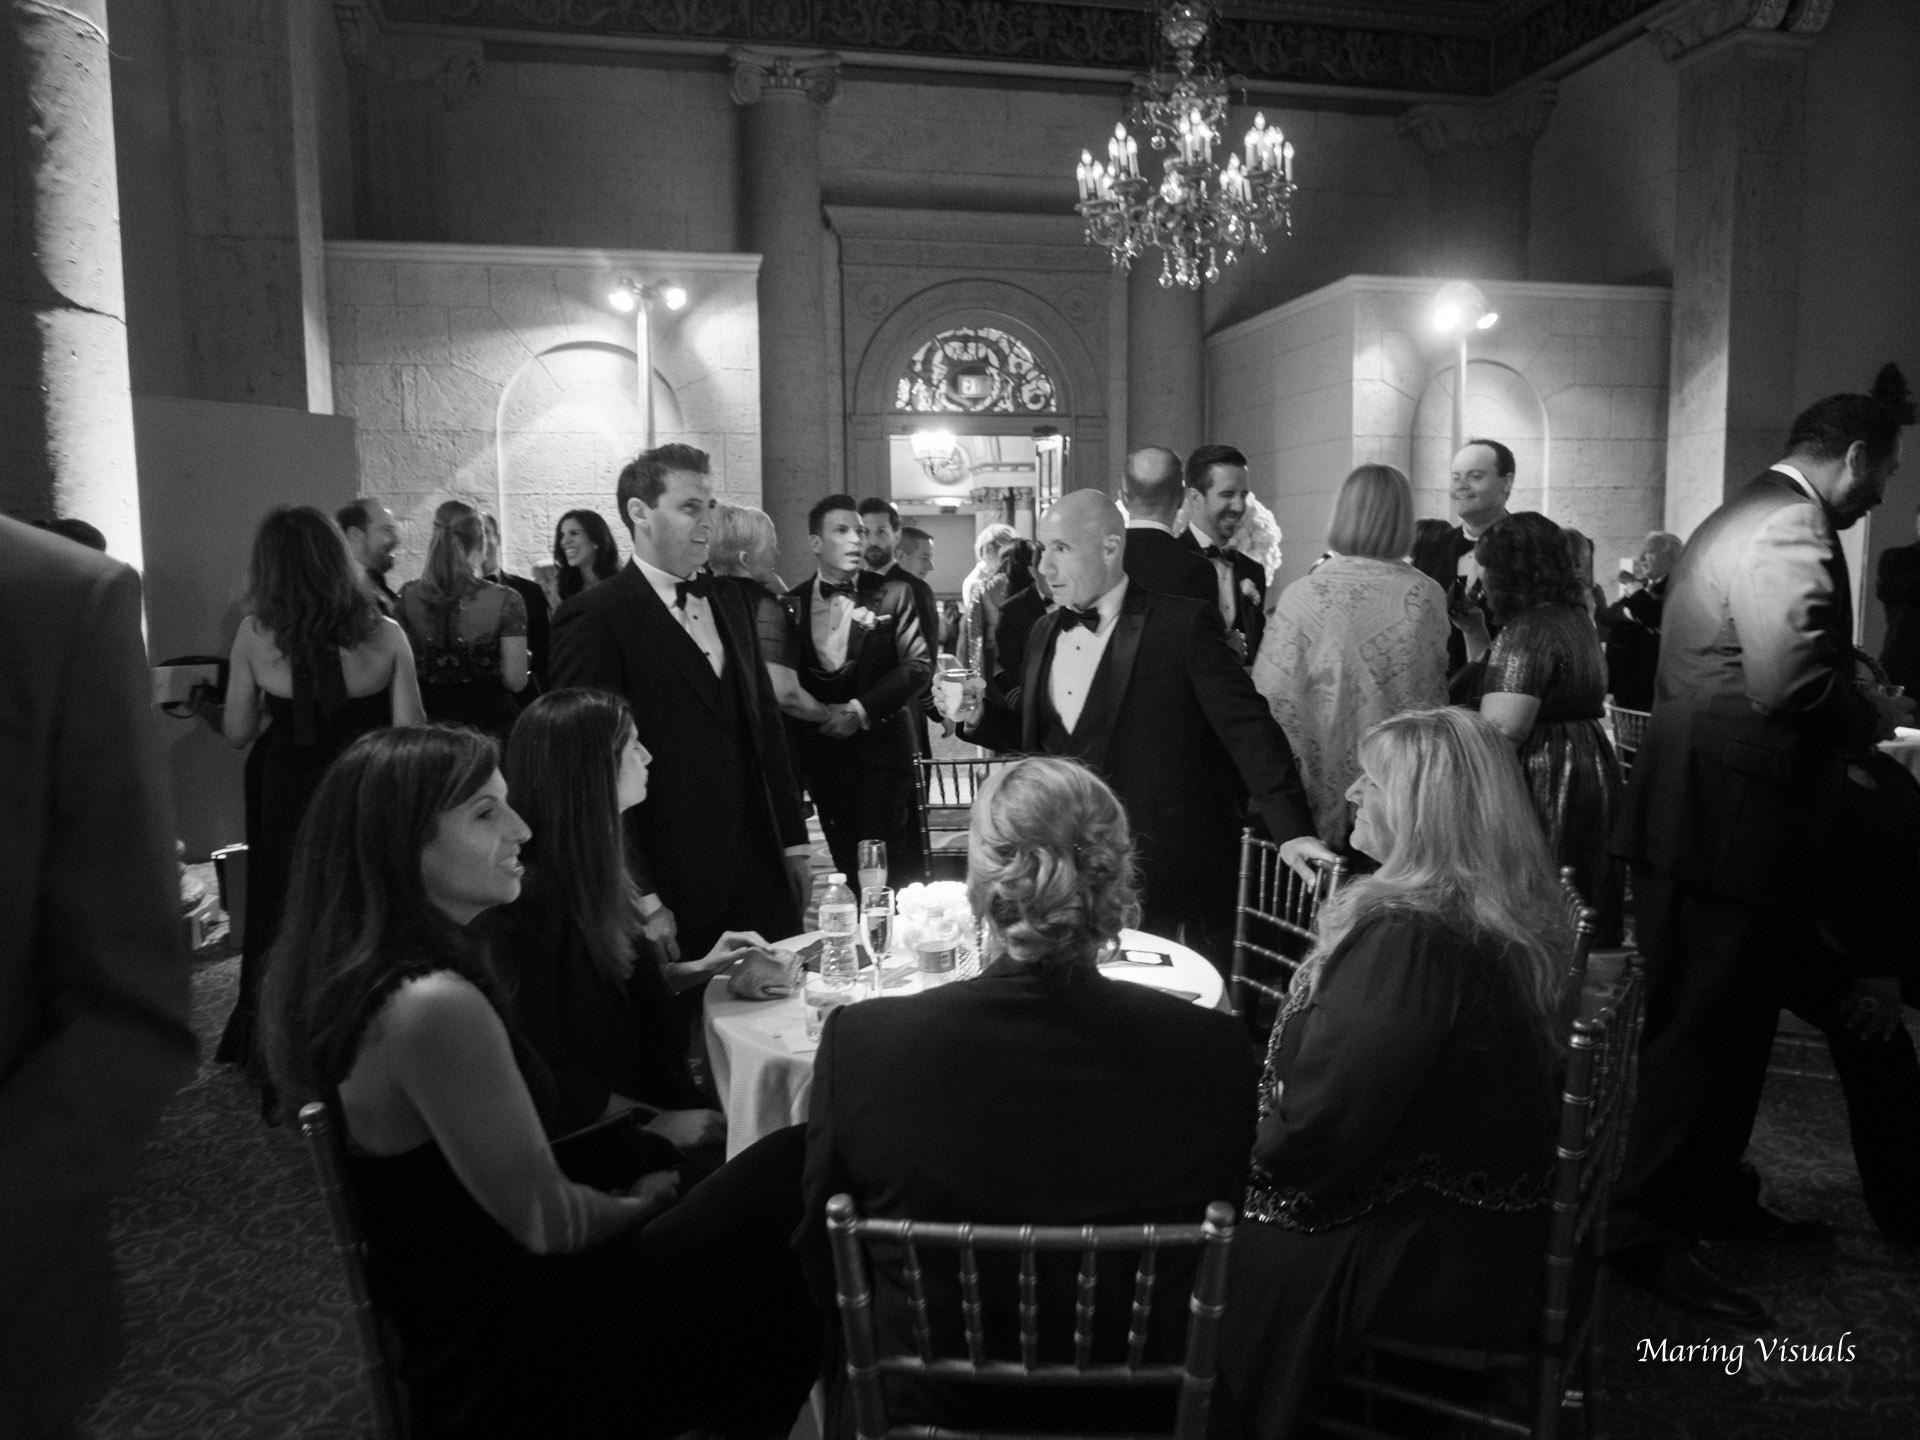 David Tutera Weddings by Maring Visuals 00546.jpg